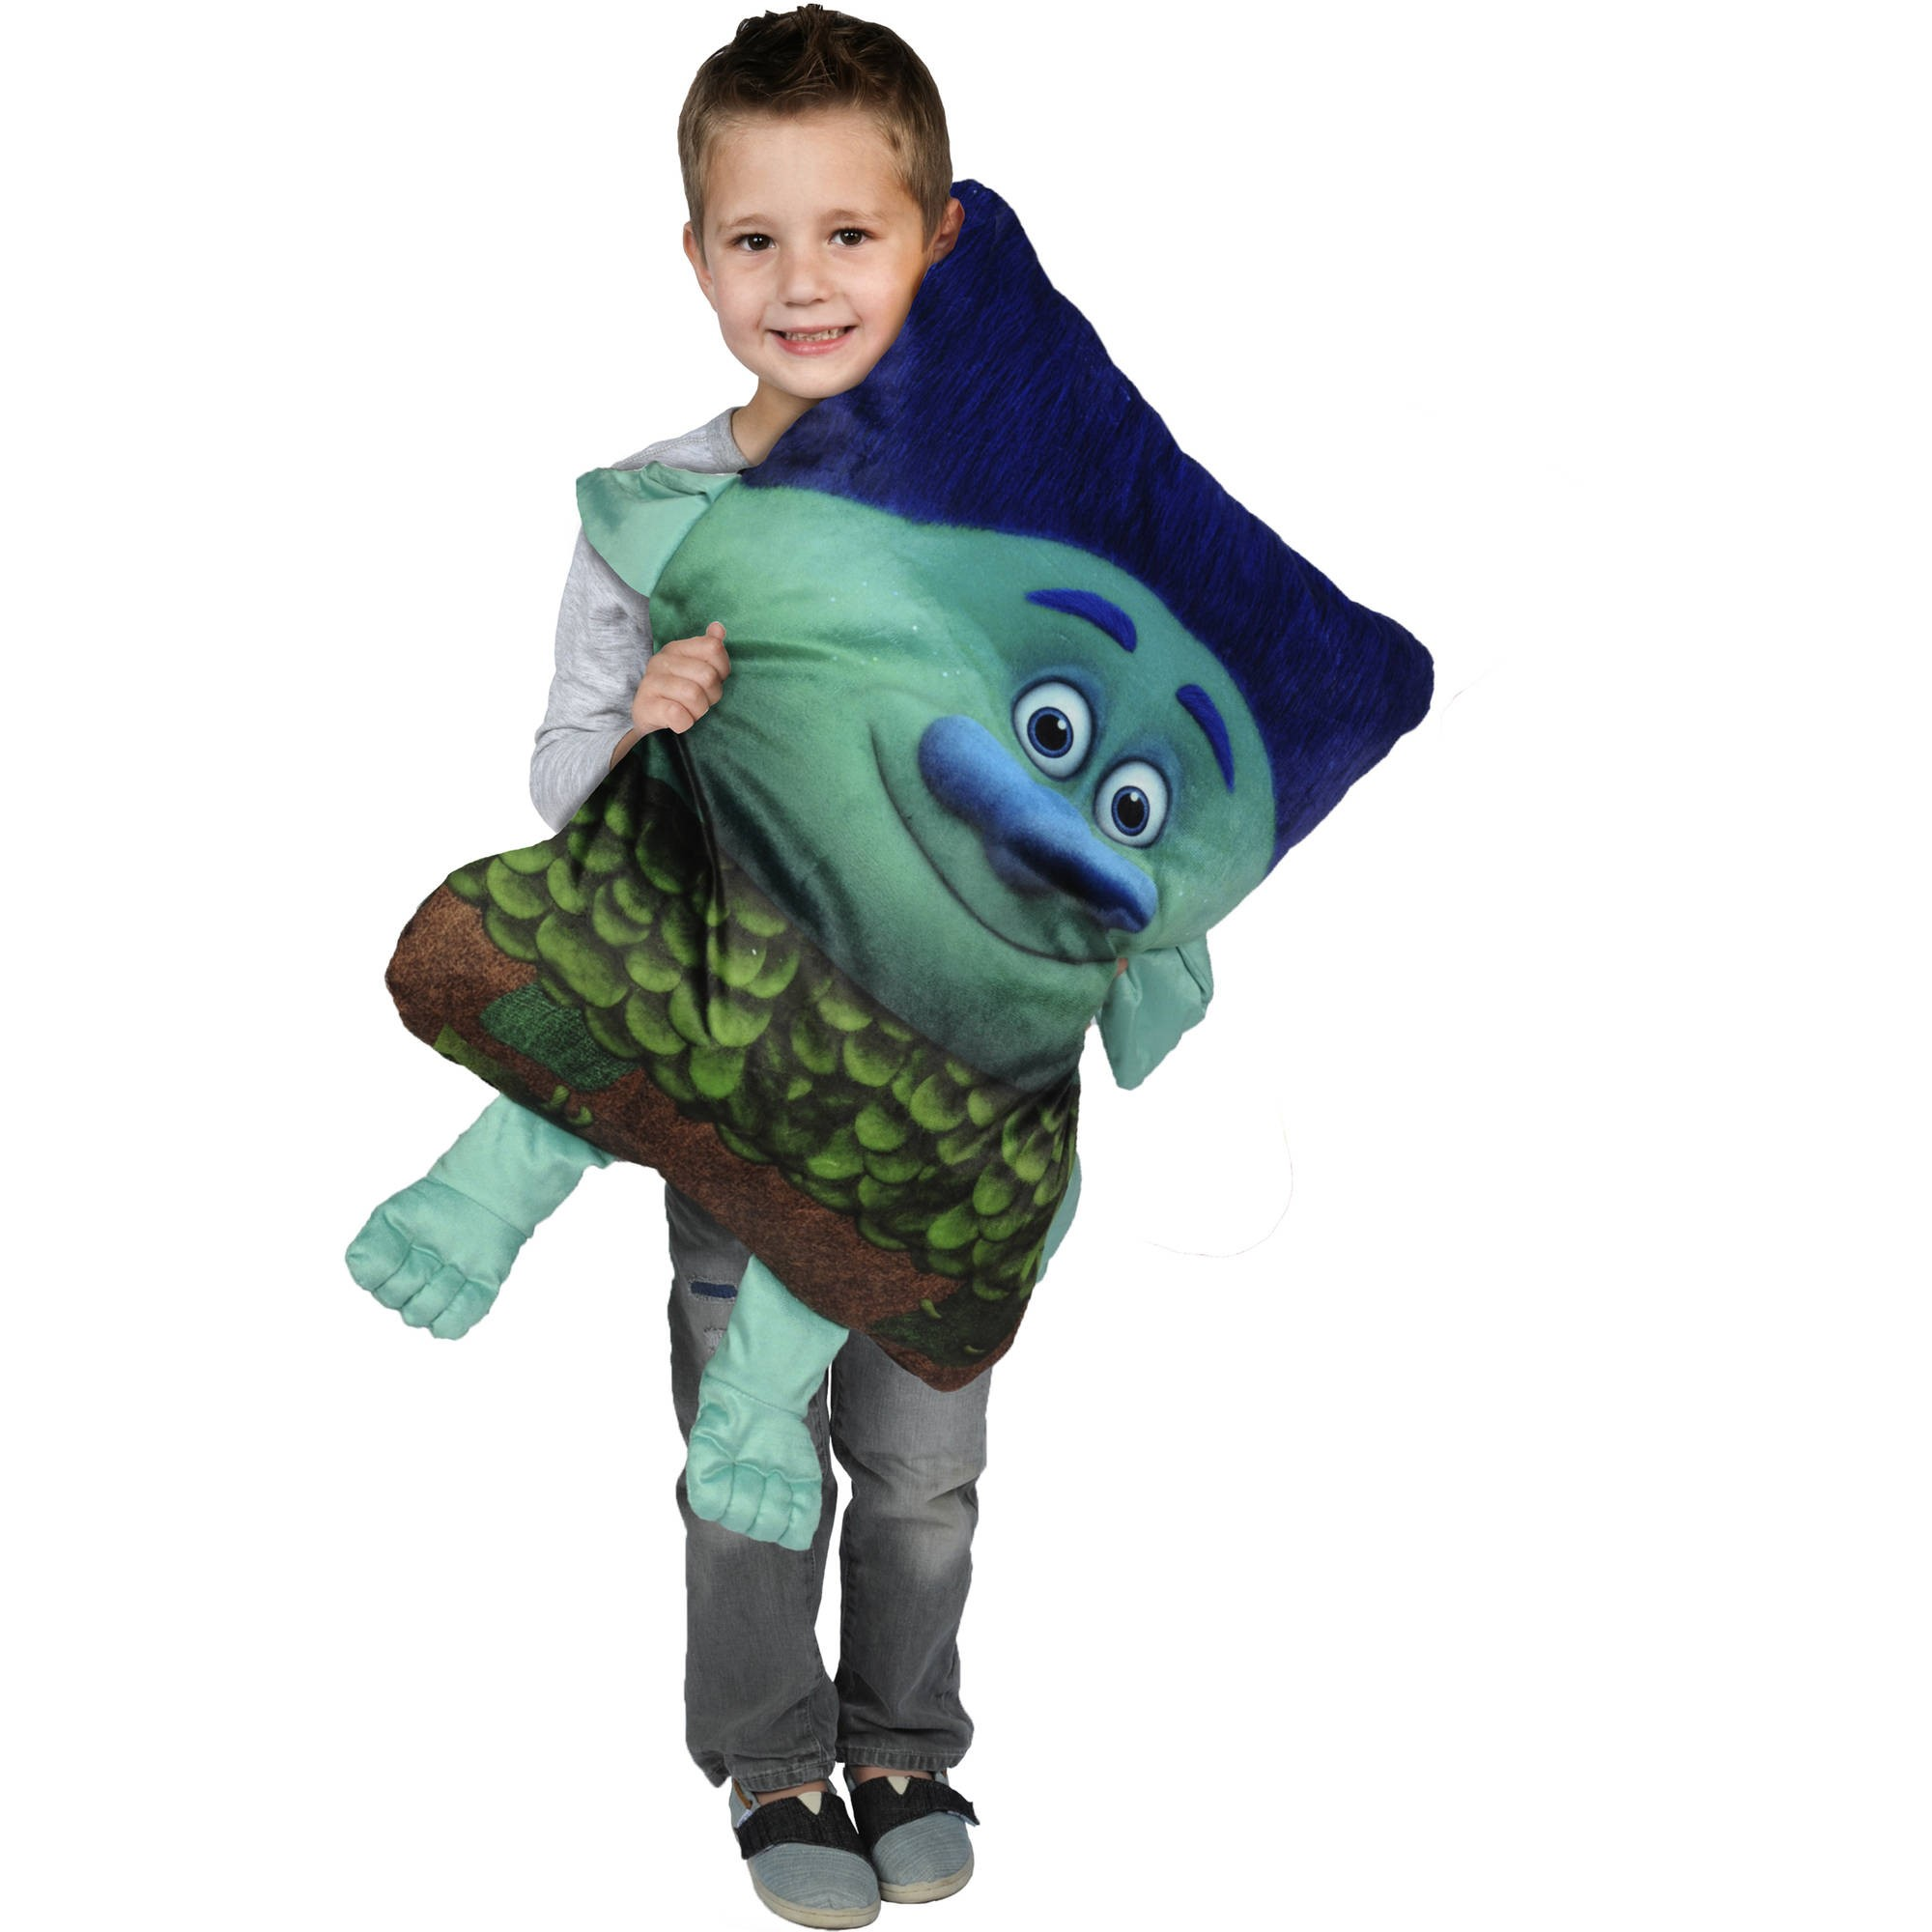 DreamWorks Trolls Branch 3D Pillow Buddy by Franco